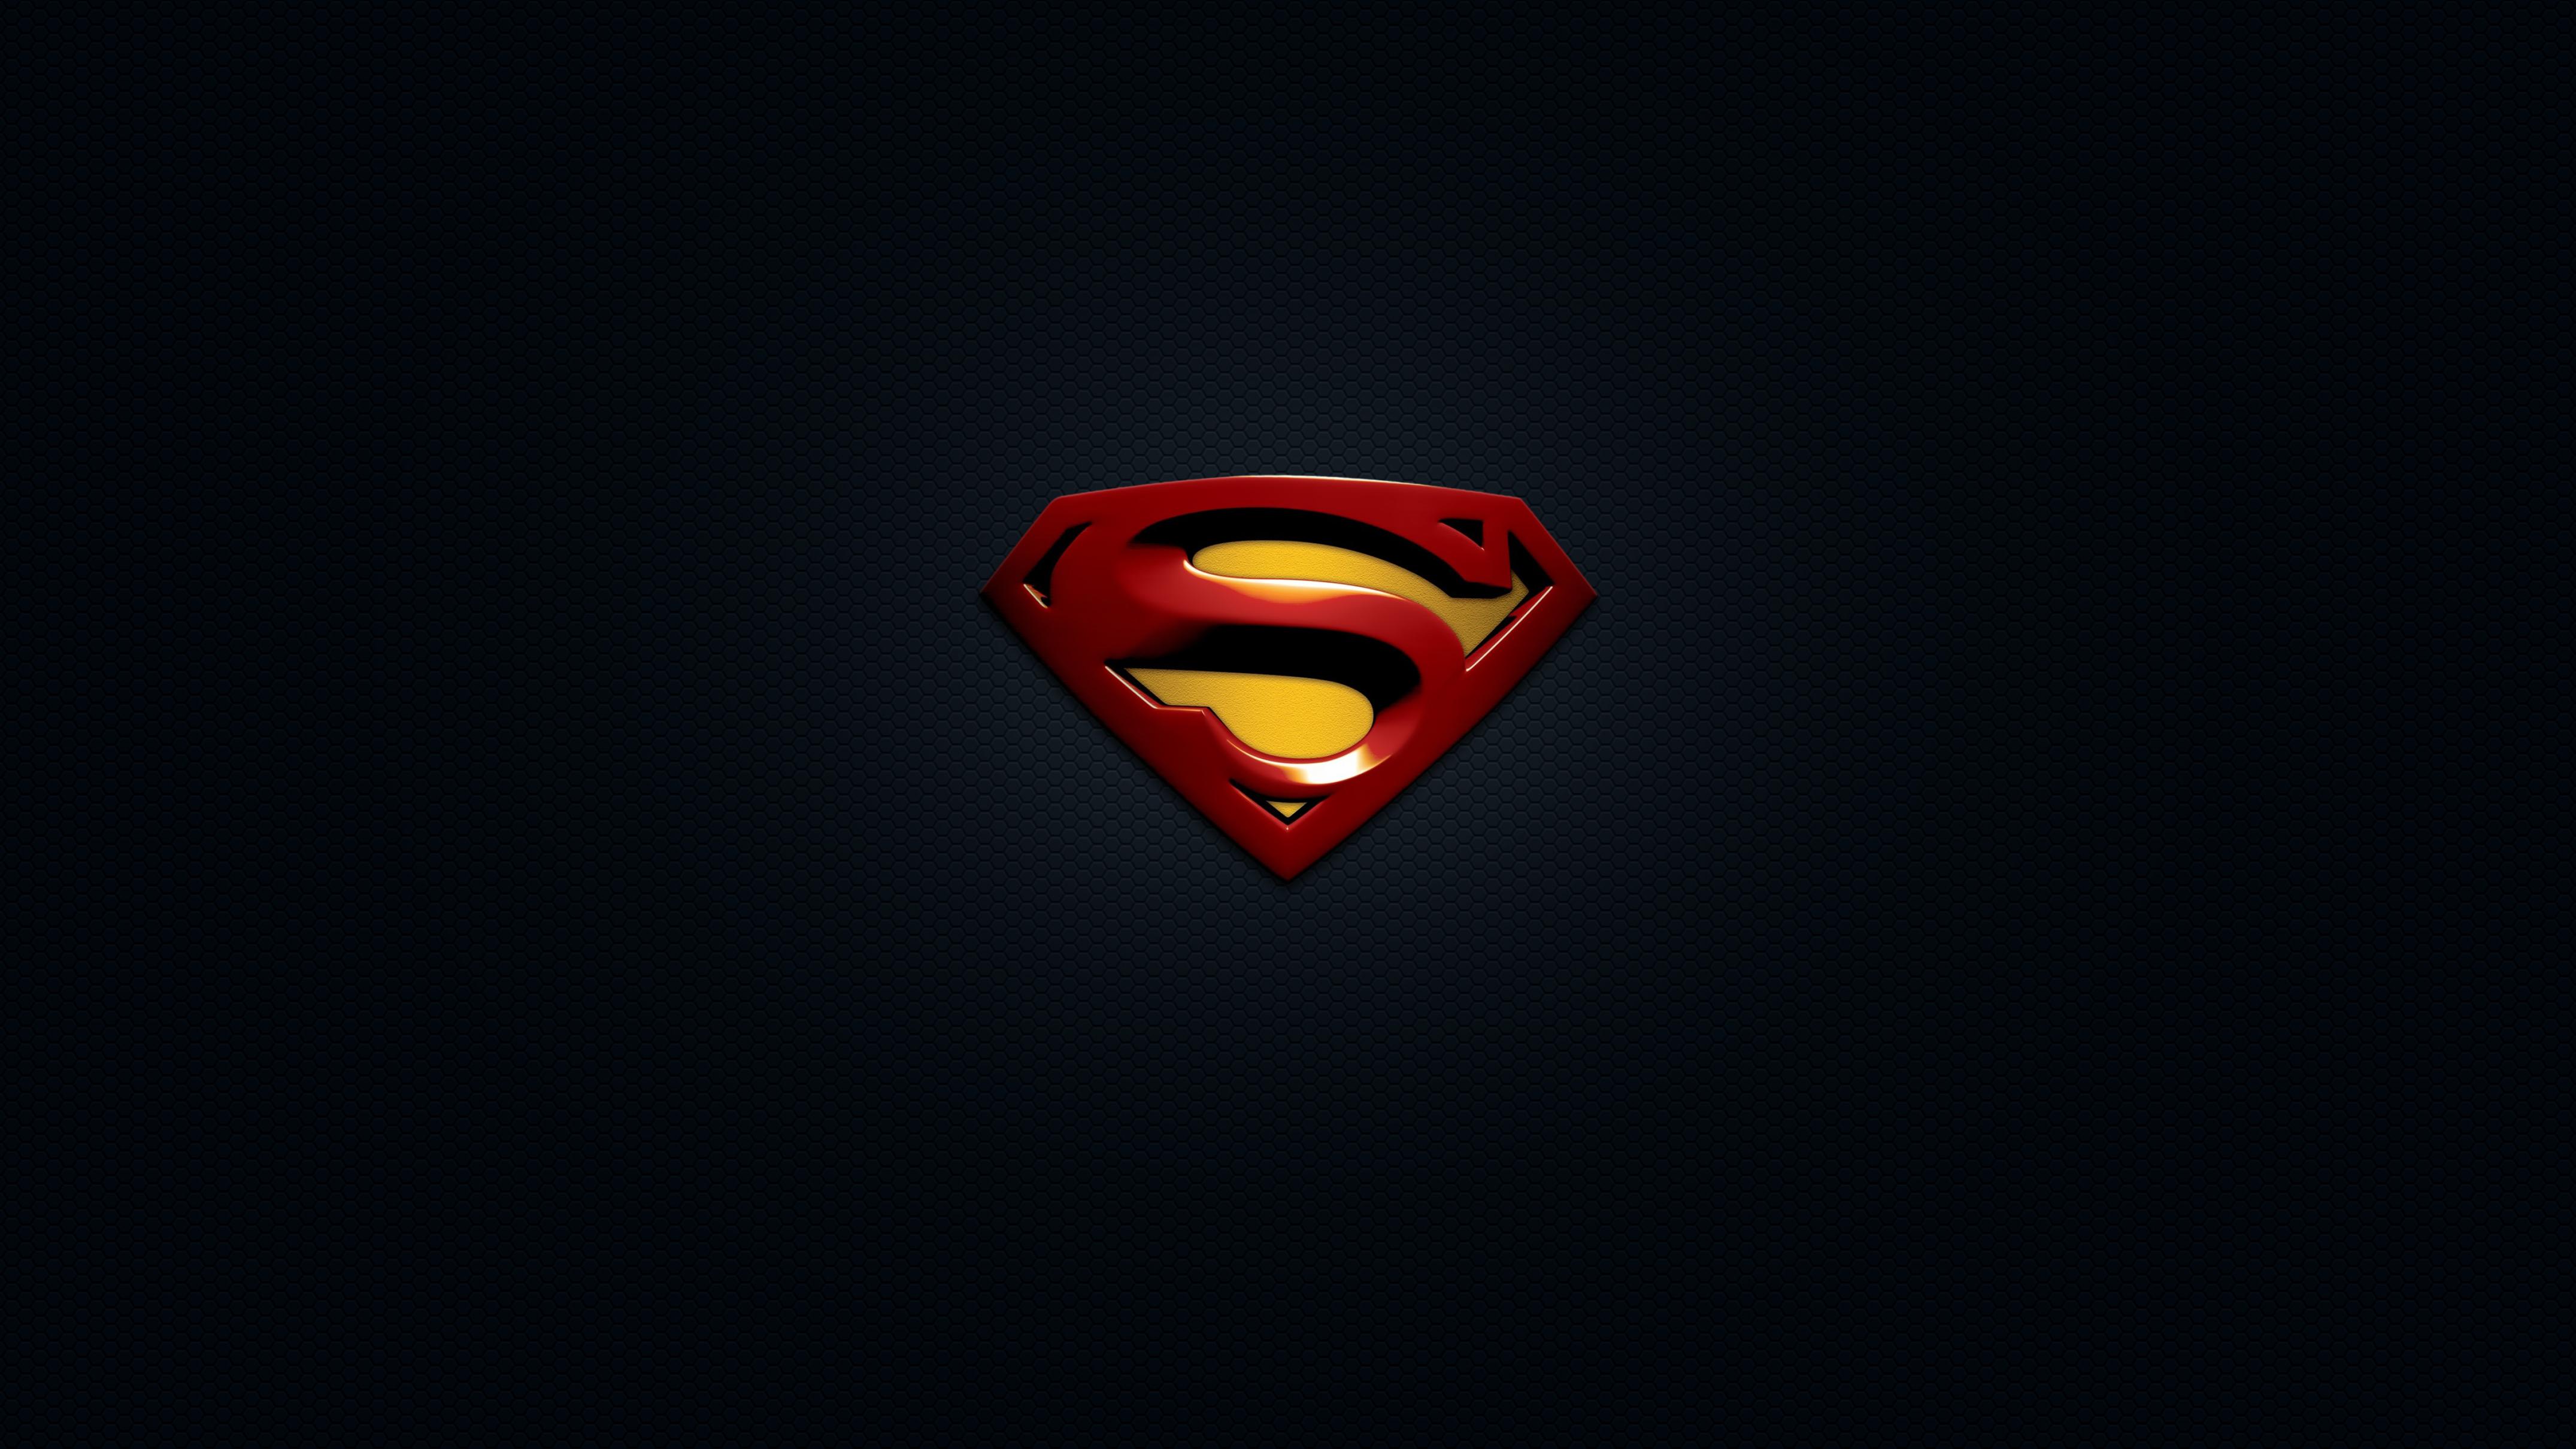 Wallpaper Superman Returns Photoshop Logo 4302x2420